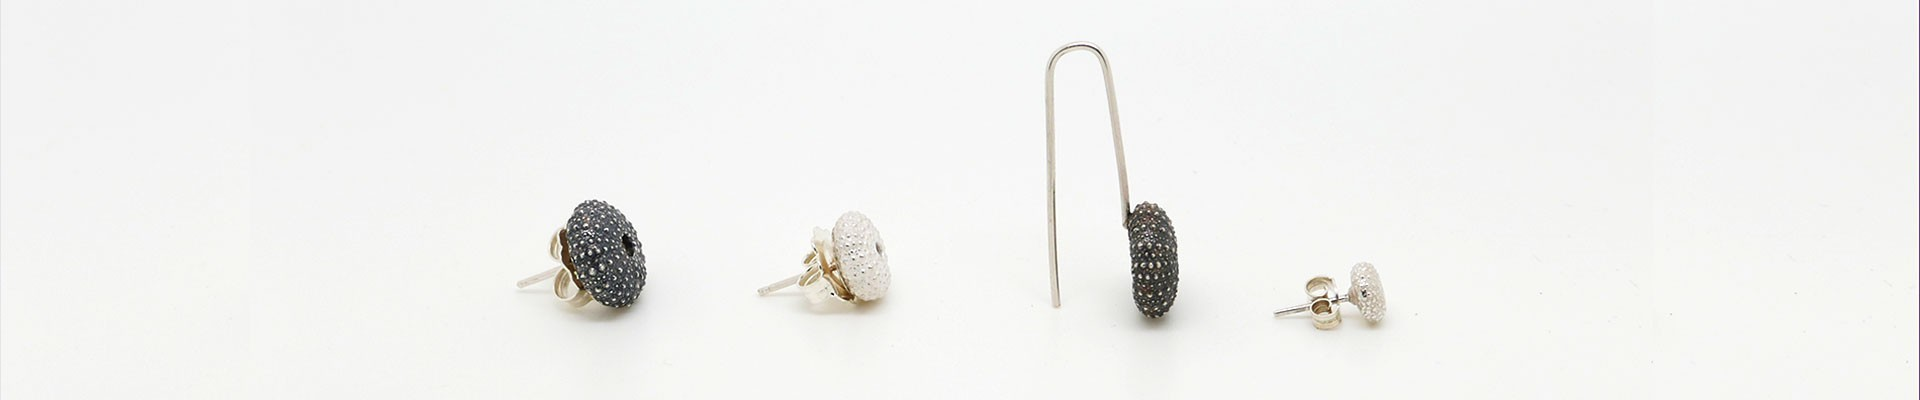 Earrings | Pitiua.com